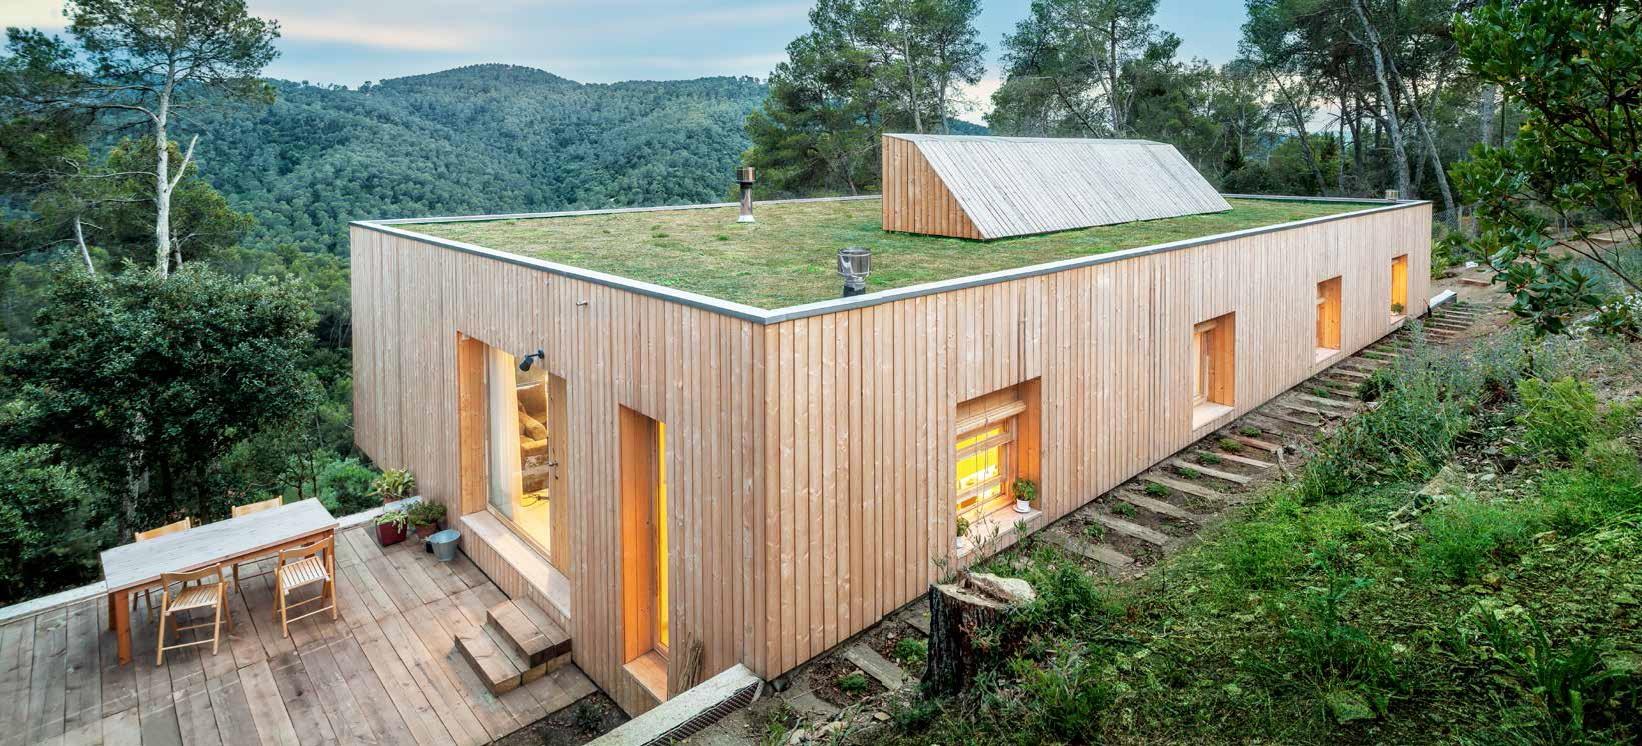 costruire una casa per due sorelle casa naturale